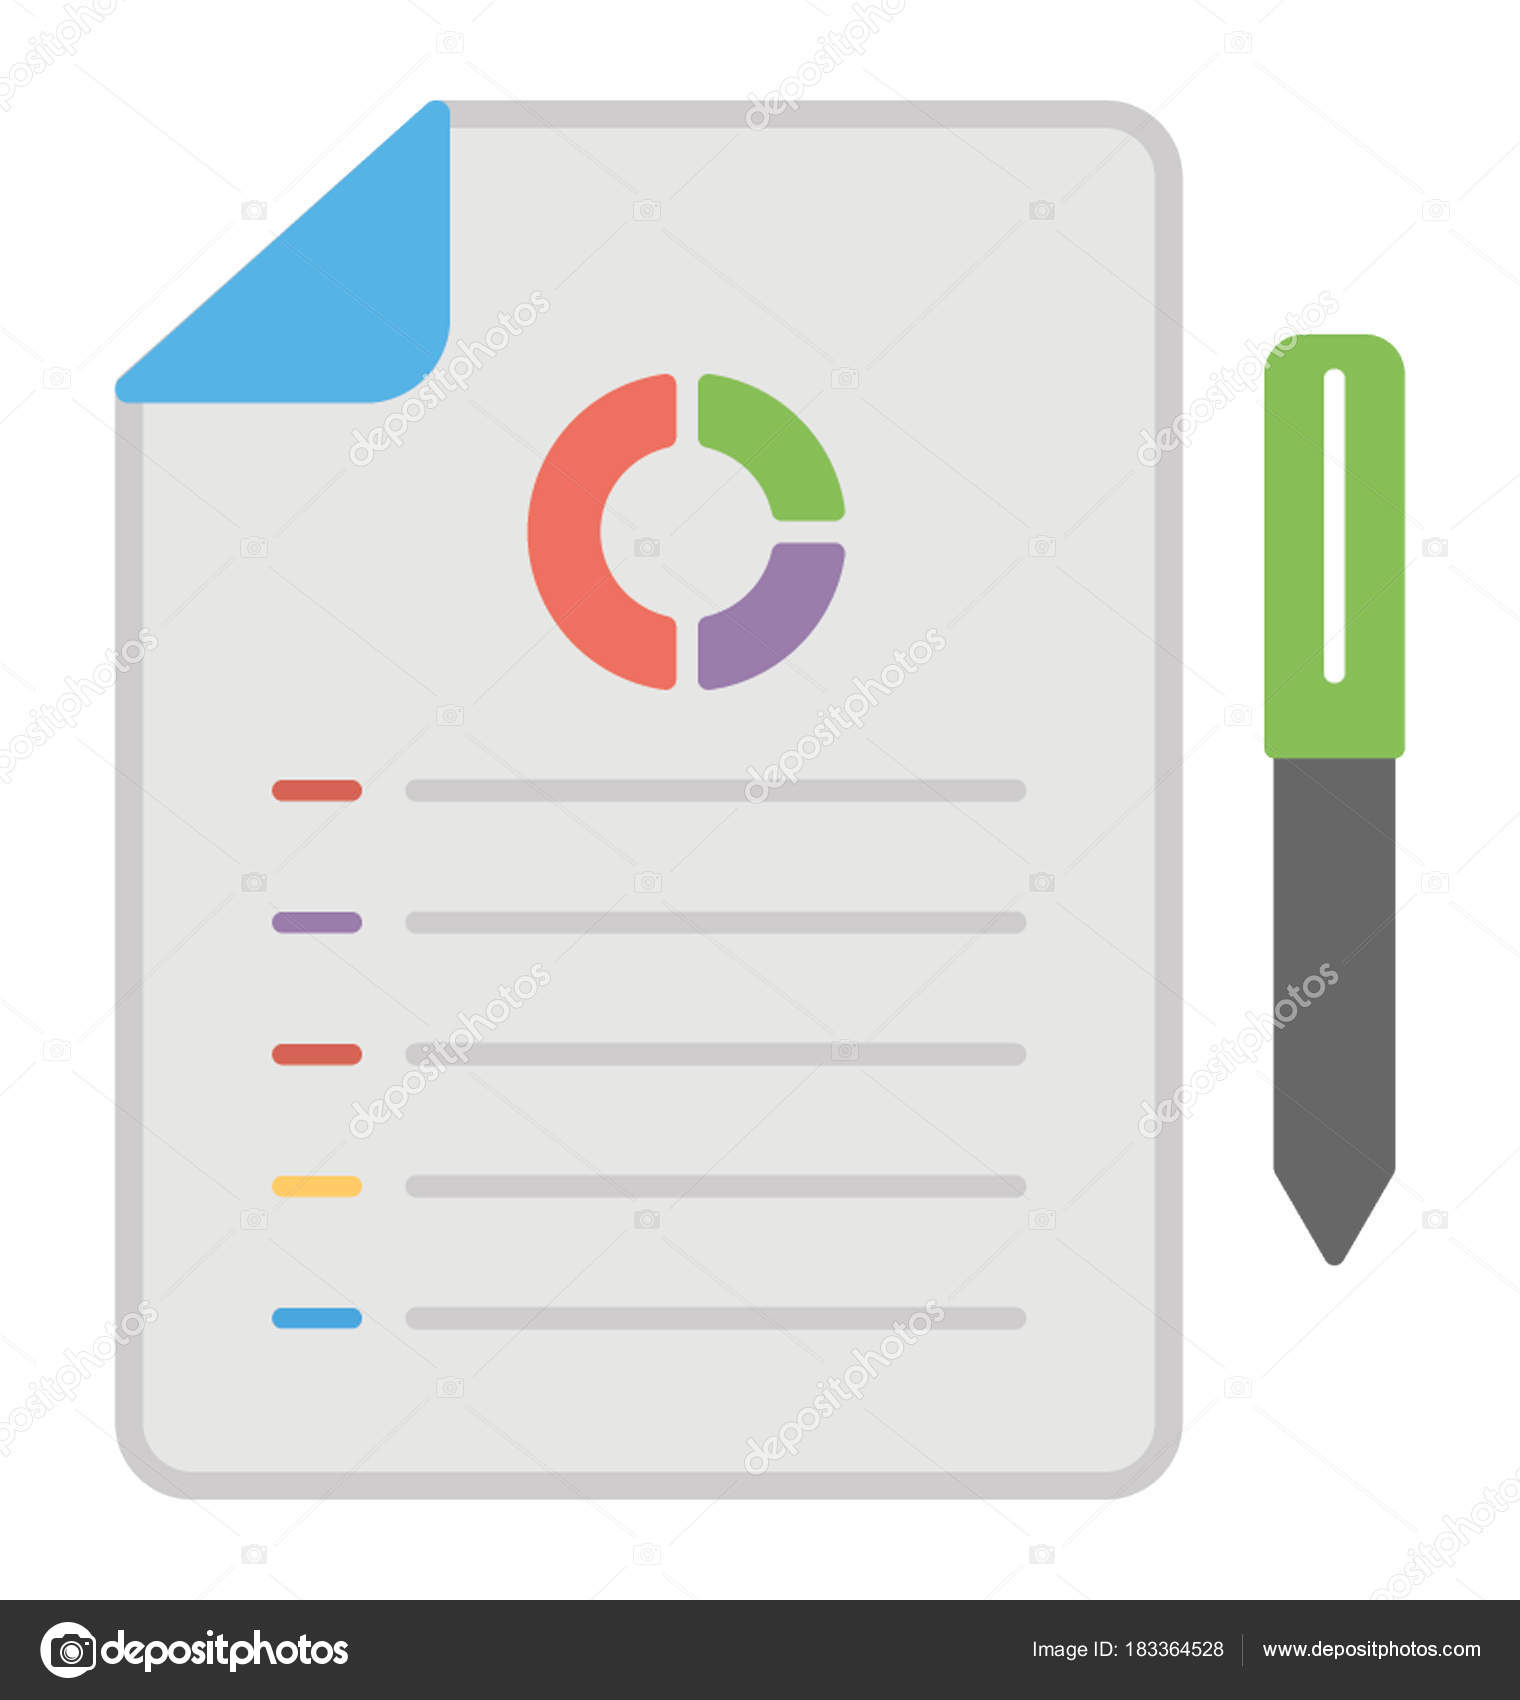 Pie Chart Analysis Flat Design Customer Survey Concept Stock